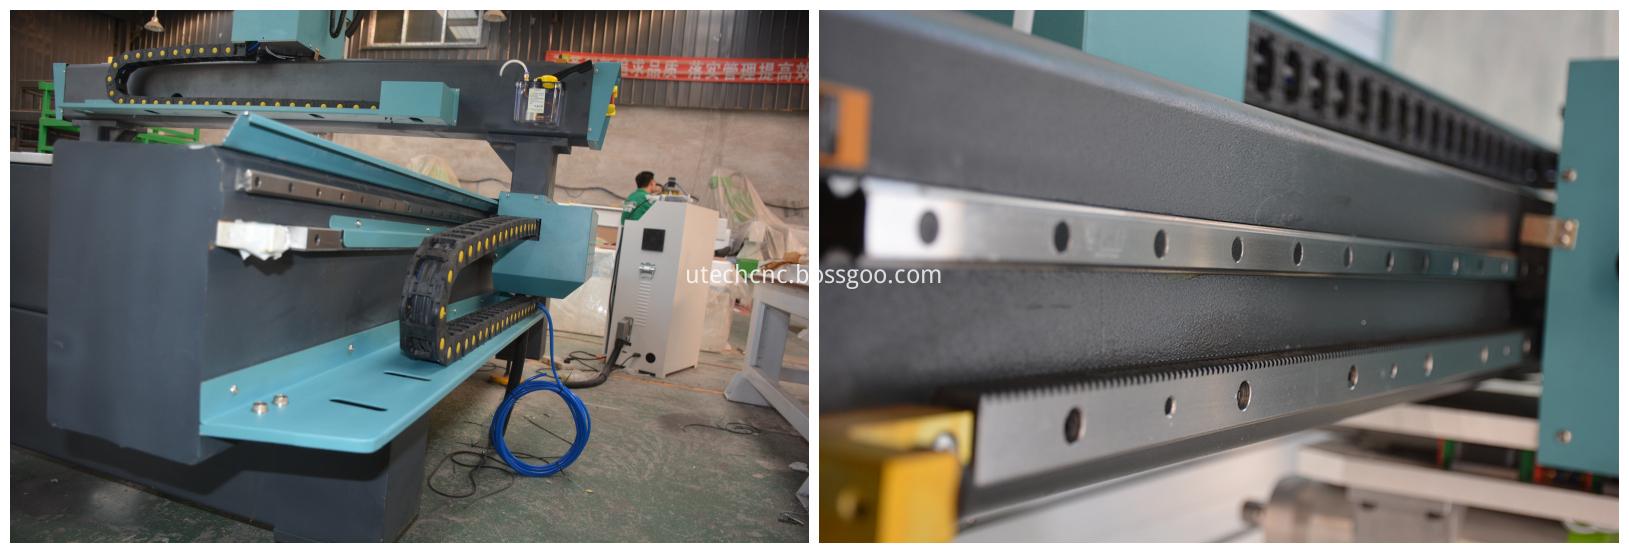 aluminum cnc machining service